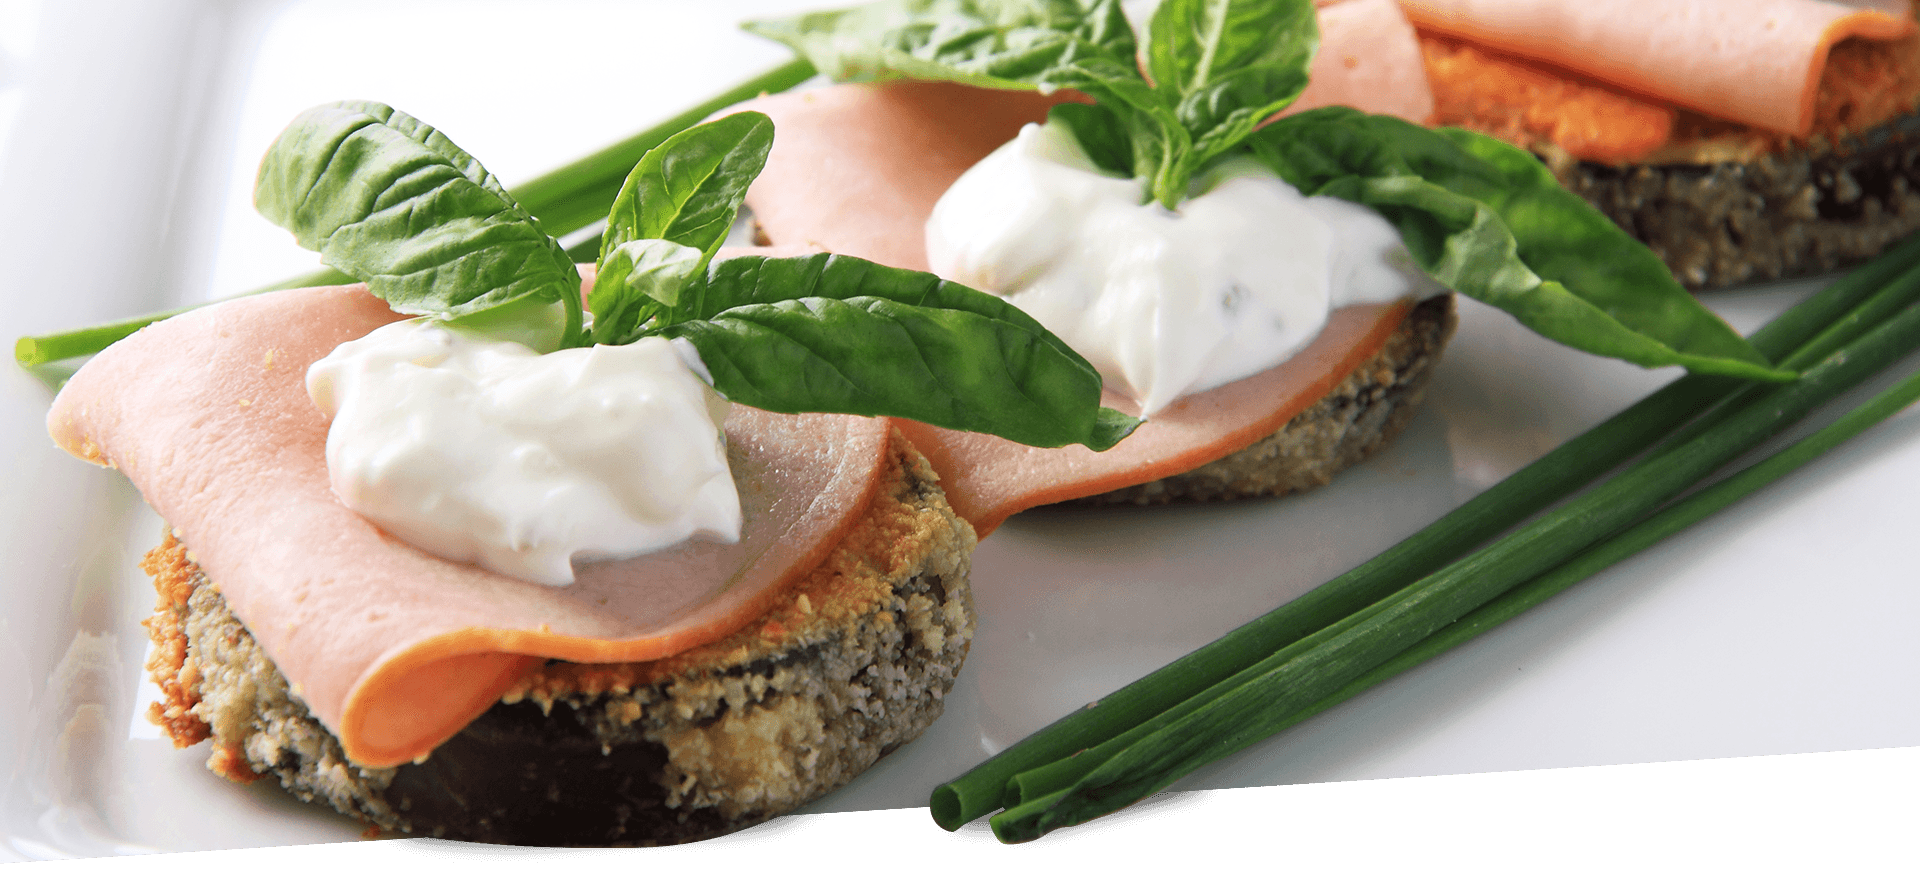 Almond Crusted Eggplant header BG